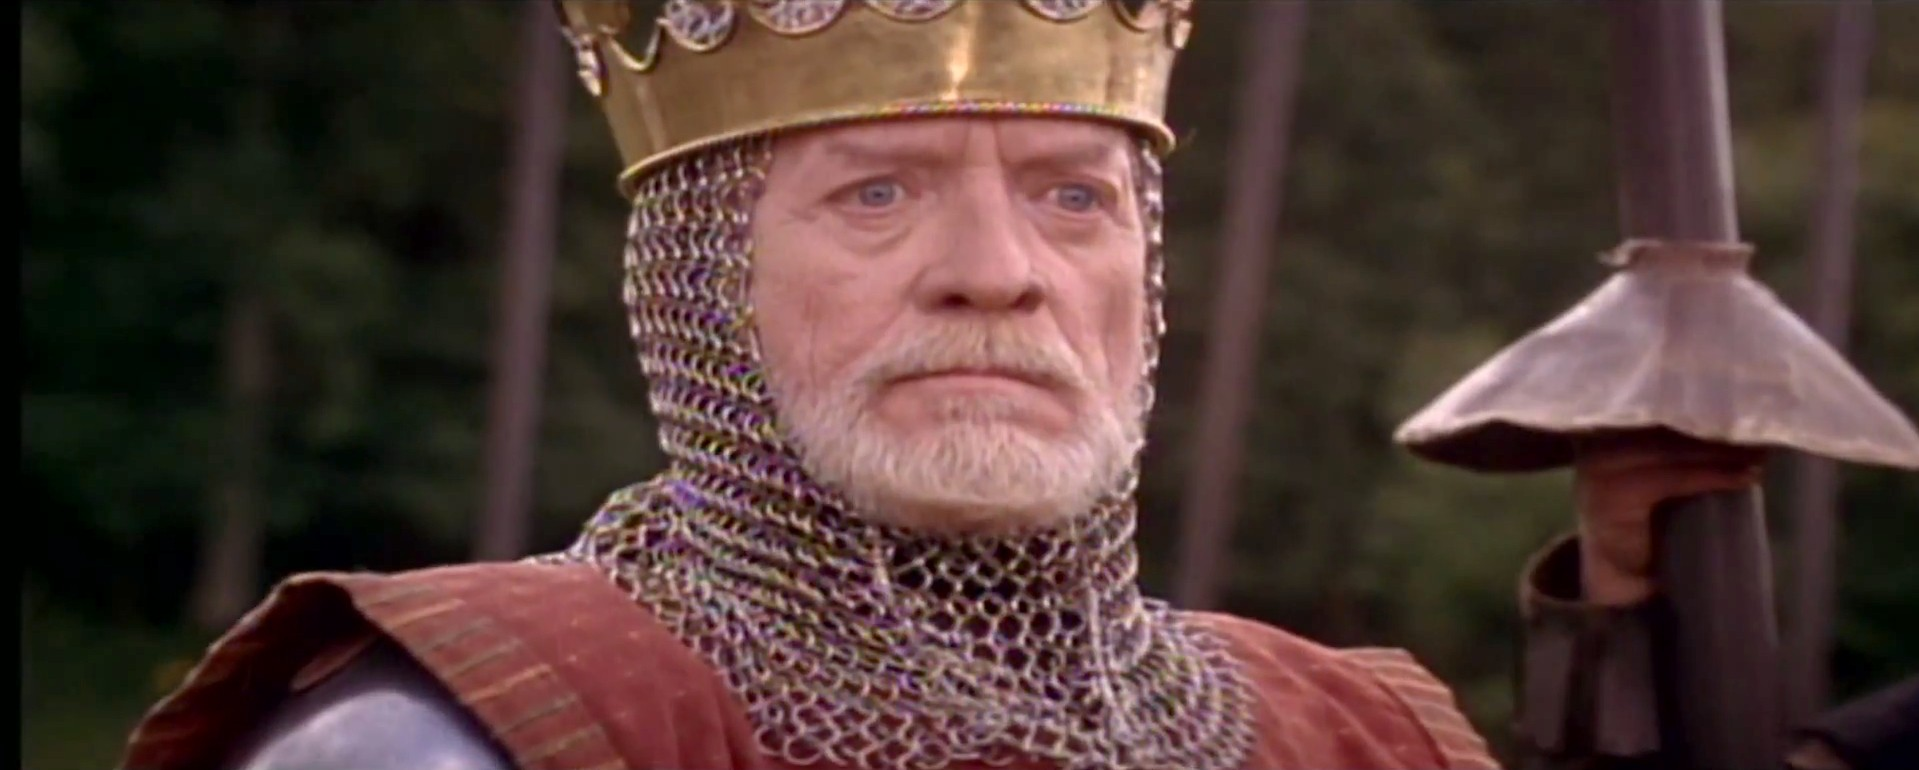 Patrick McGoohan Longshanks King Edward I